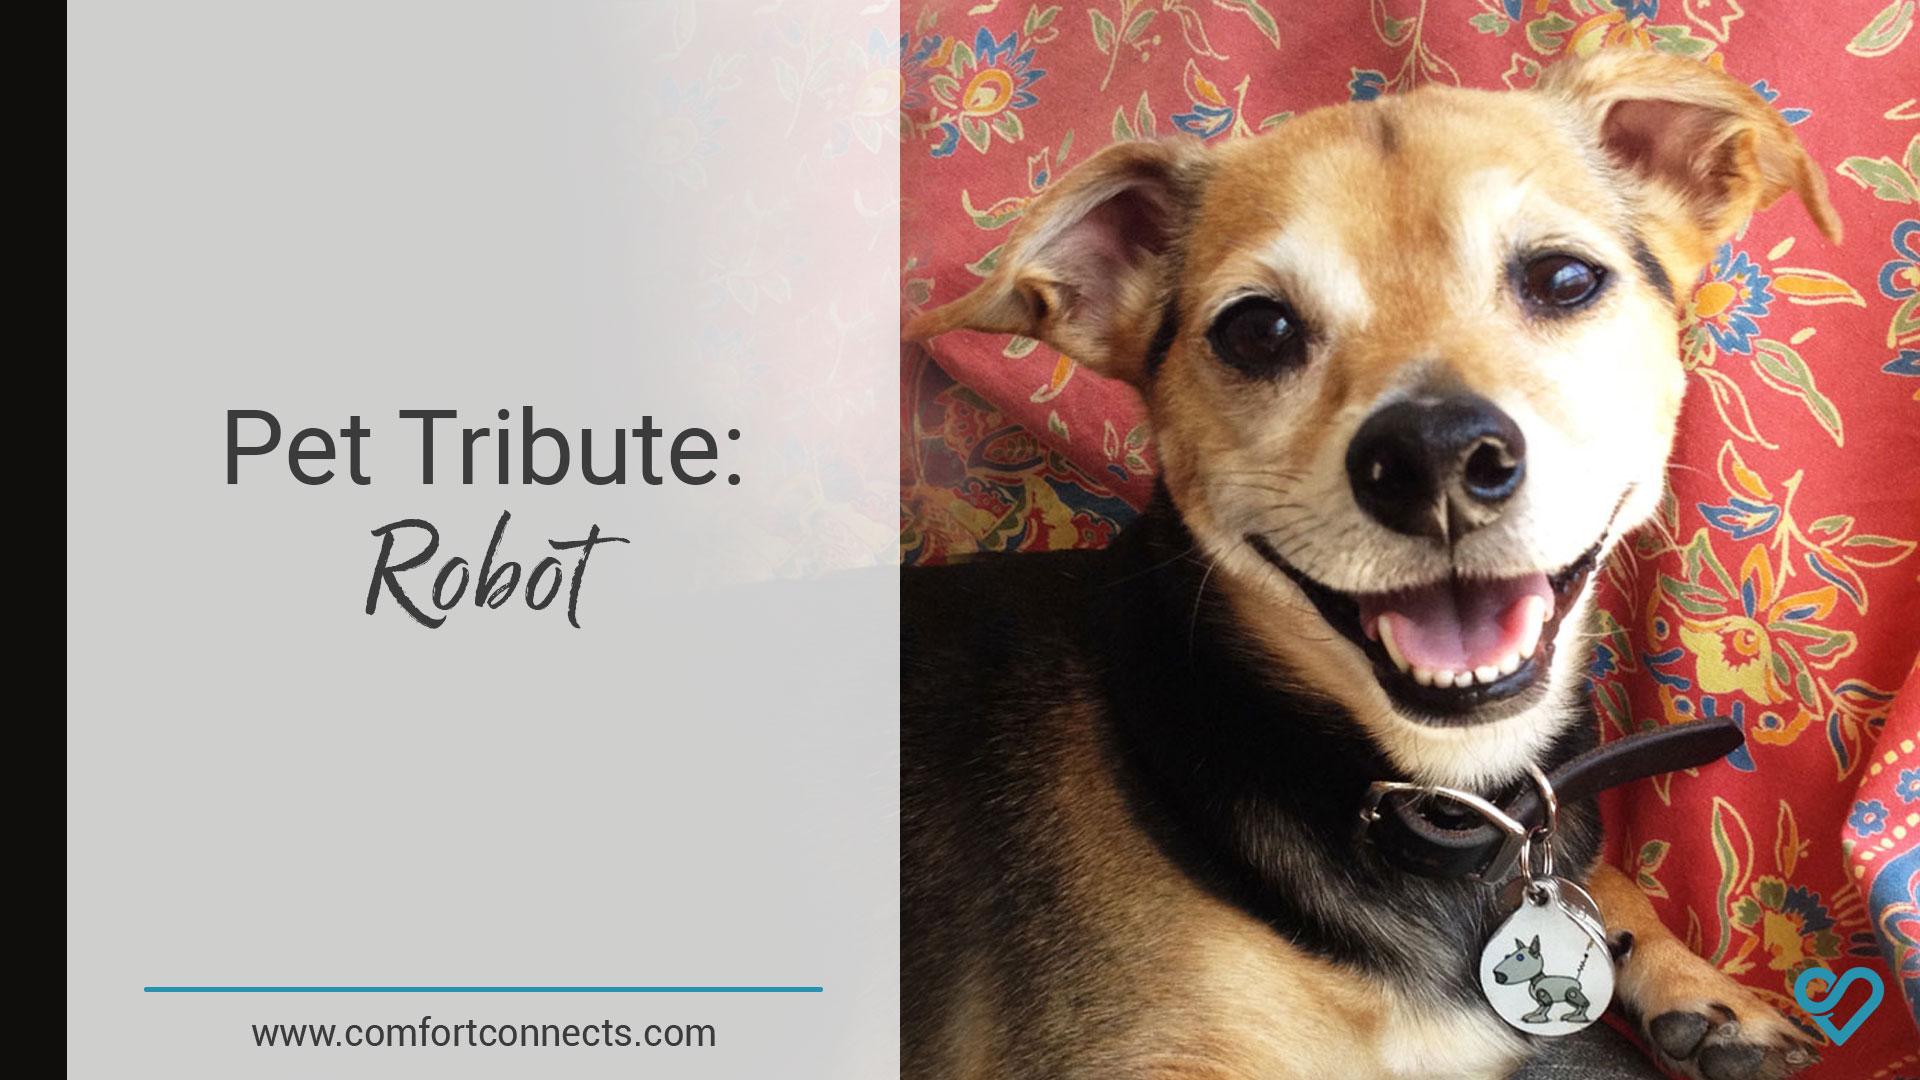 Pet Tribute: Robot